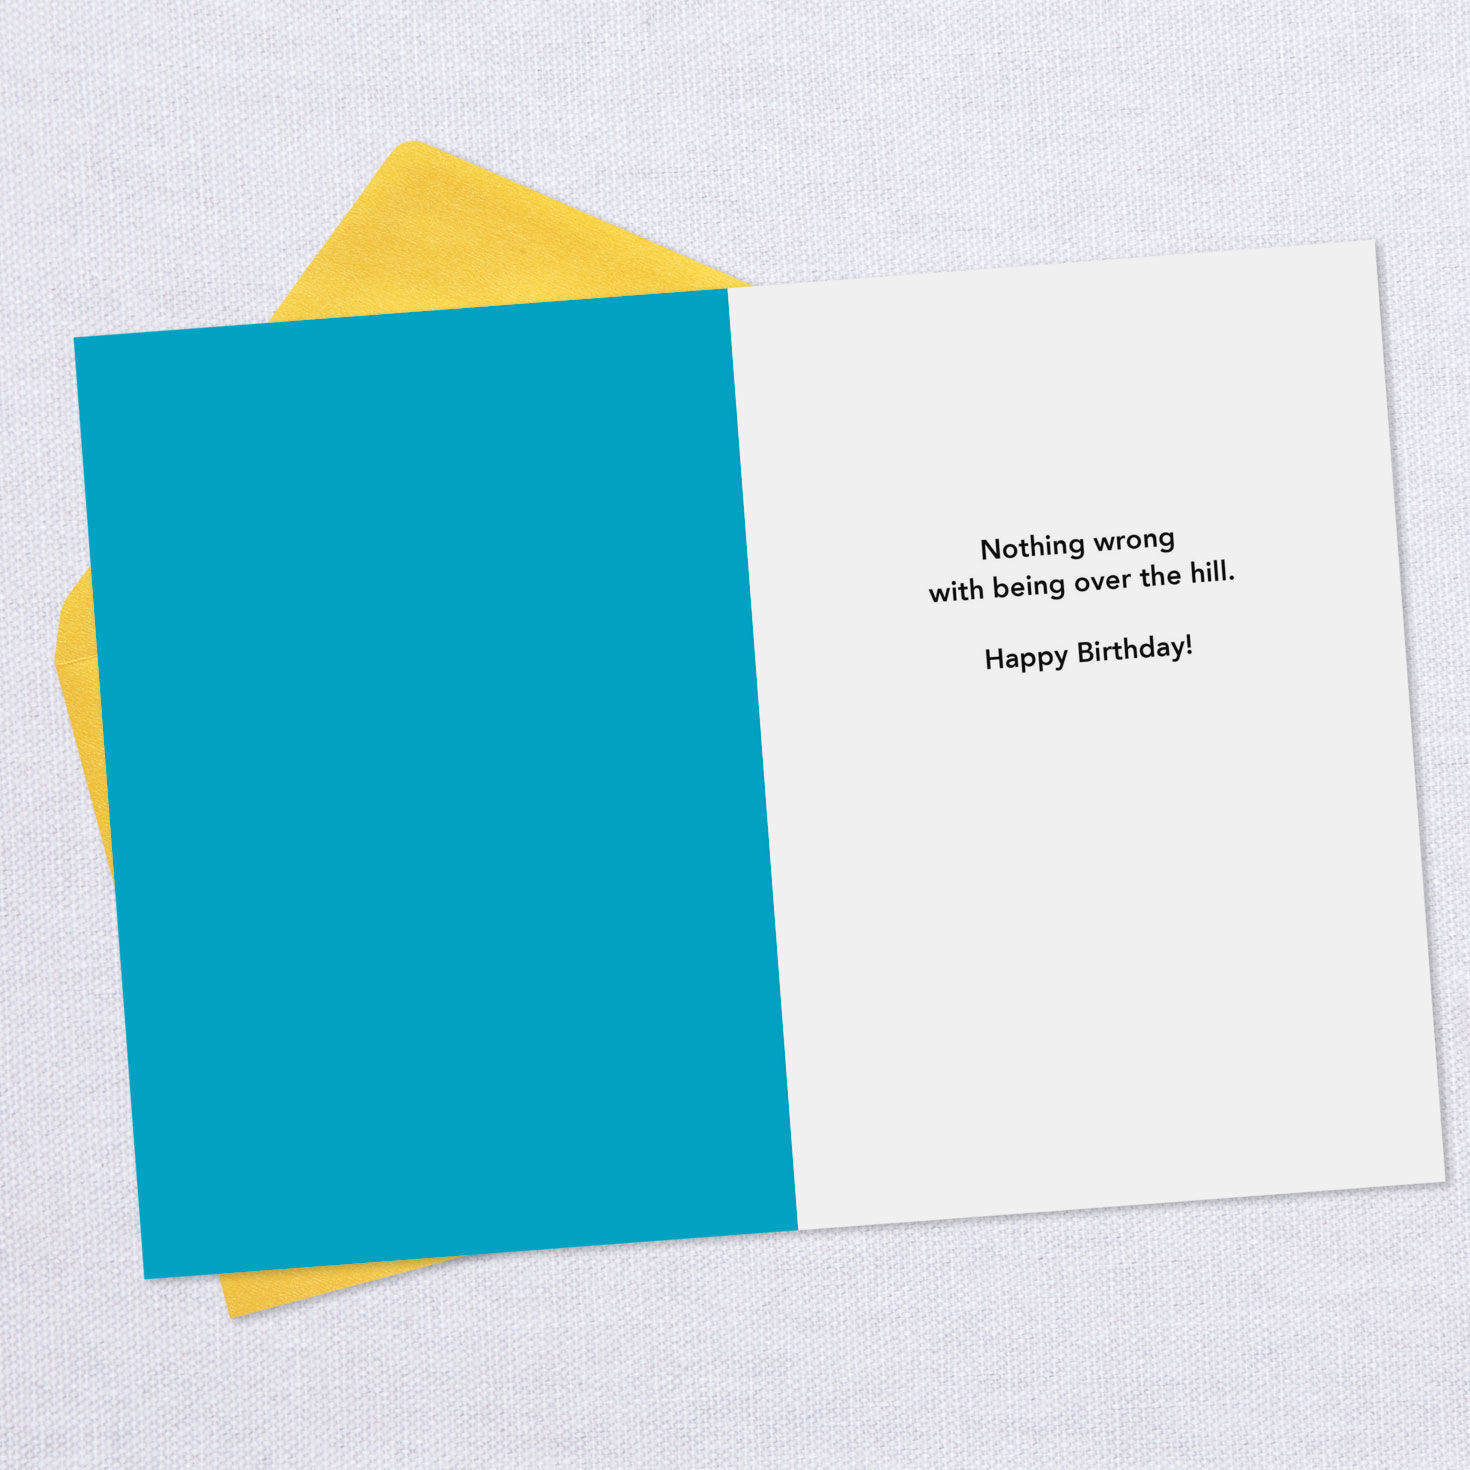 40th BIRTHDAY CARD HALLMARK Send The Very Best Milestone Over The Hill